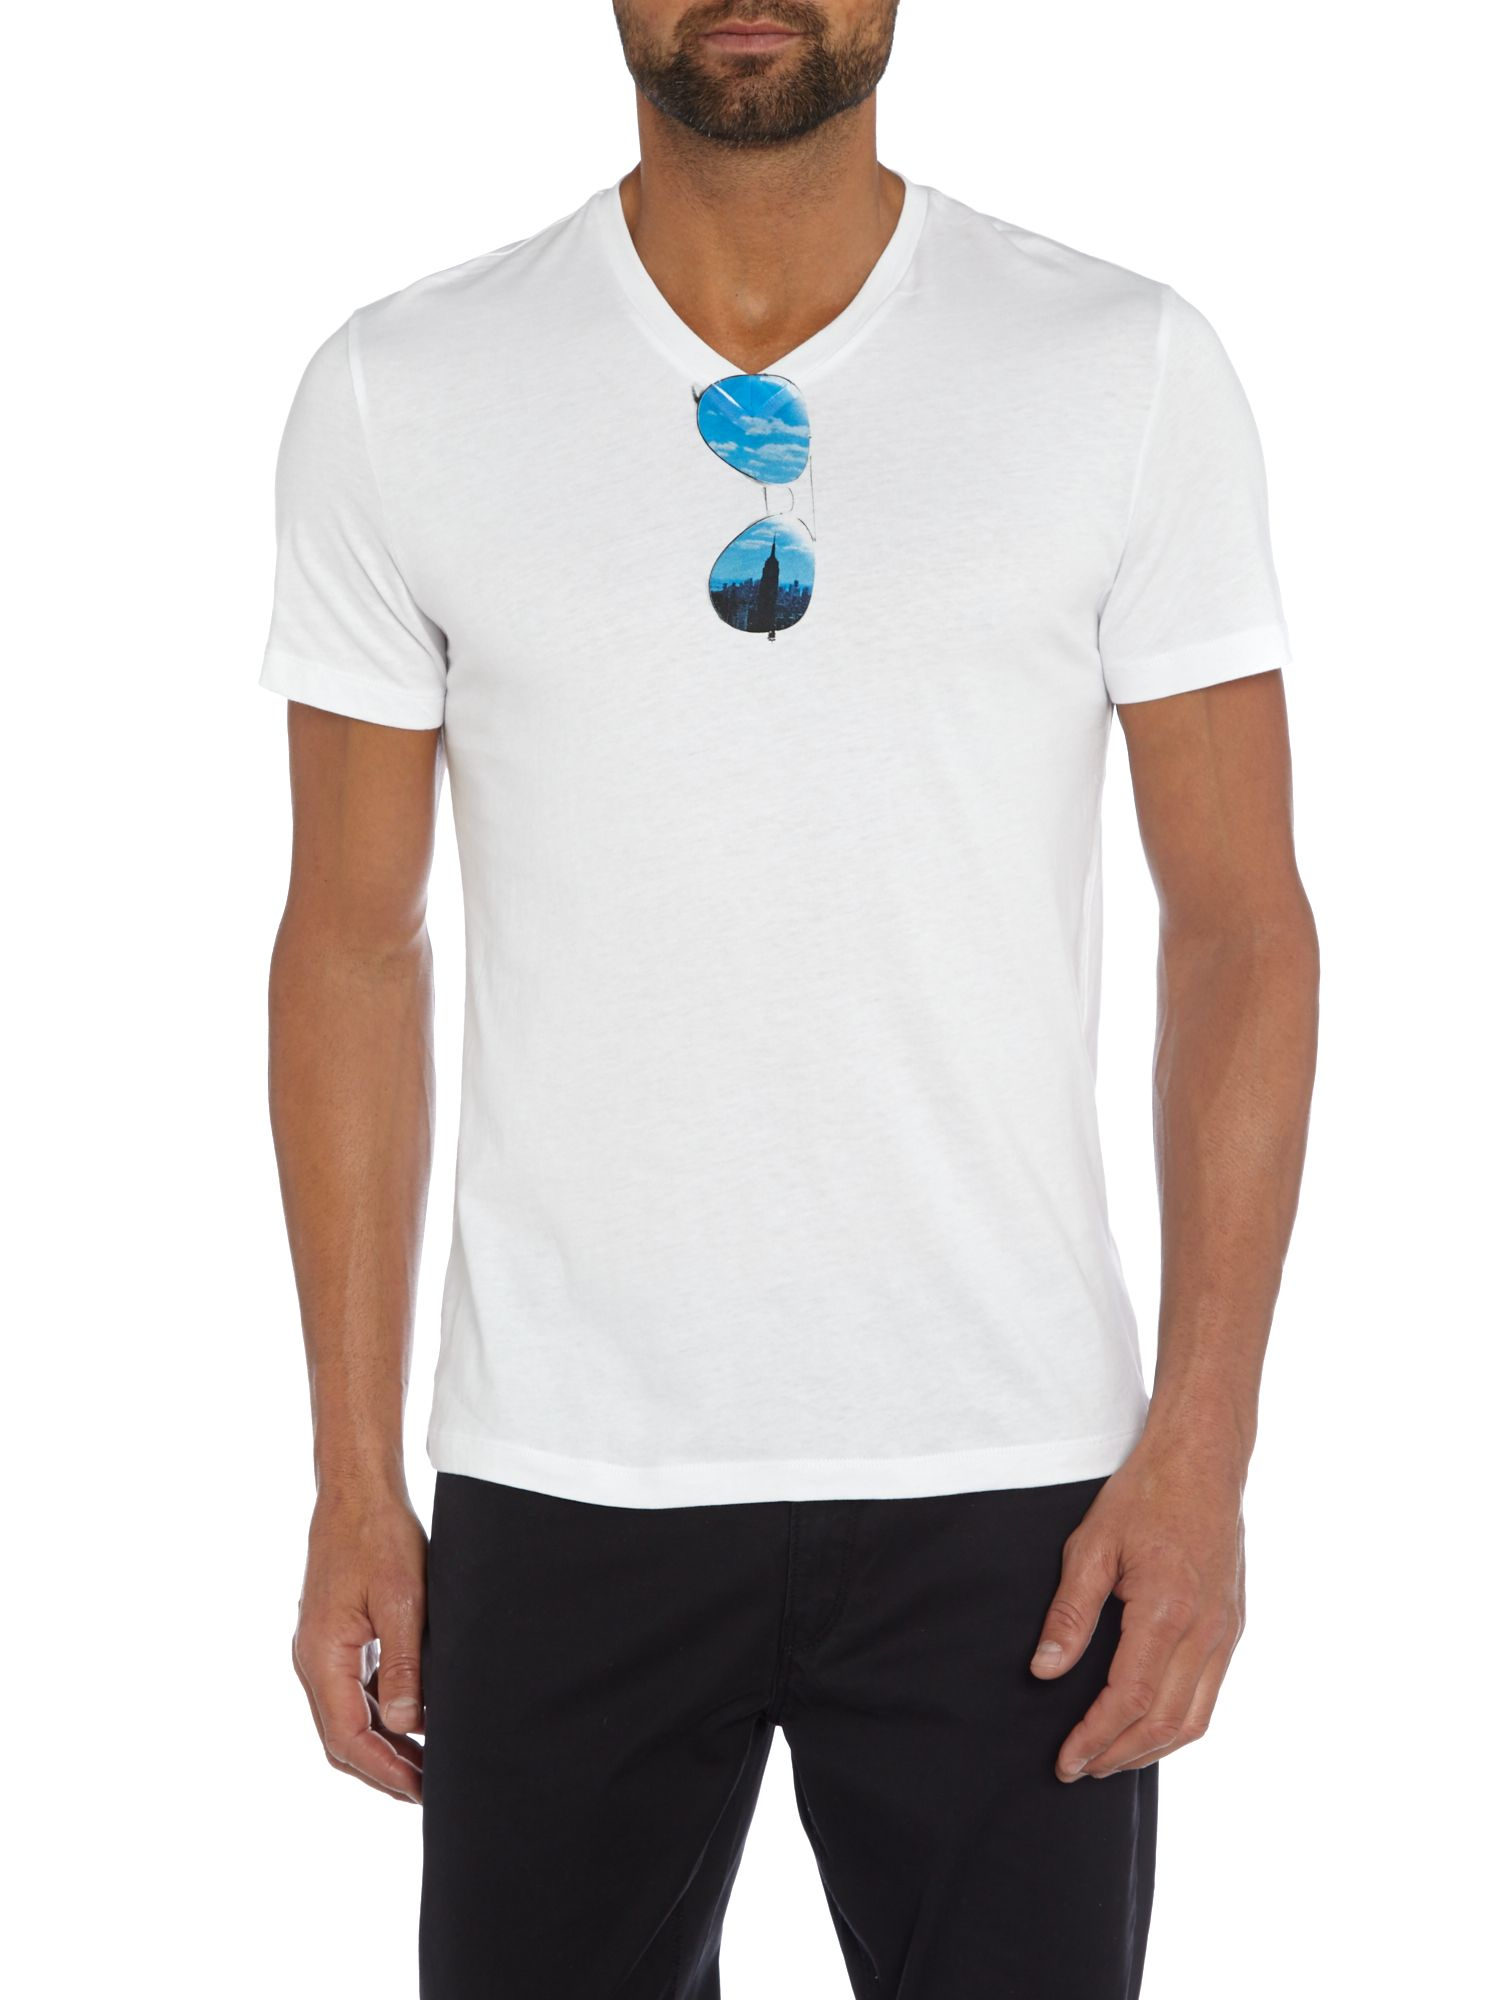 michael kors sunglasses graphic v neck t shirt in white for men lyst. Black Bedroom Furniture Sets. Home Design Ideas